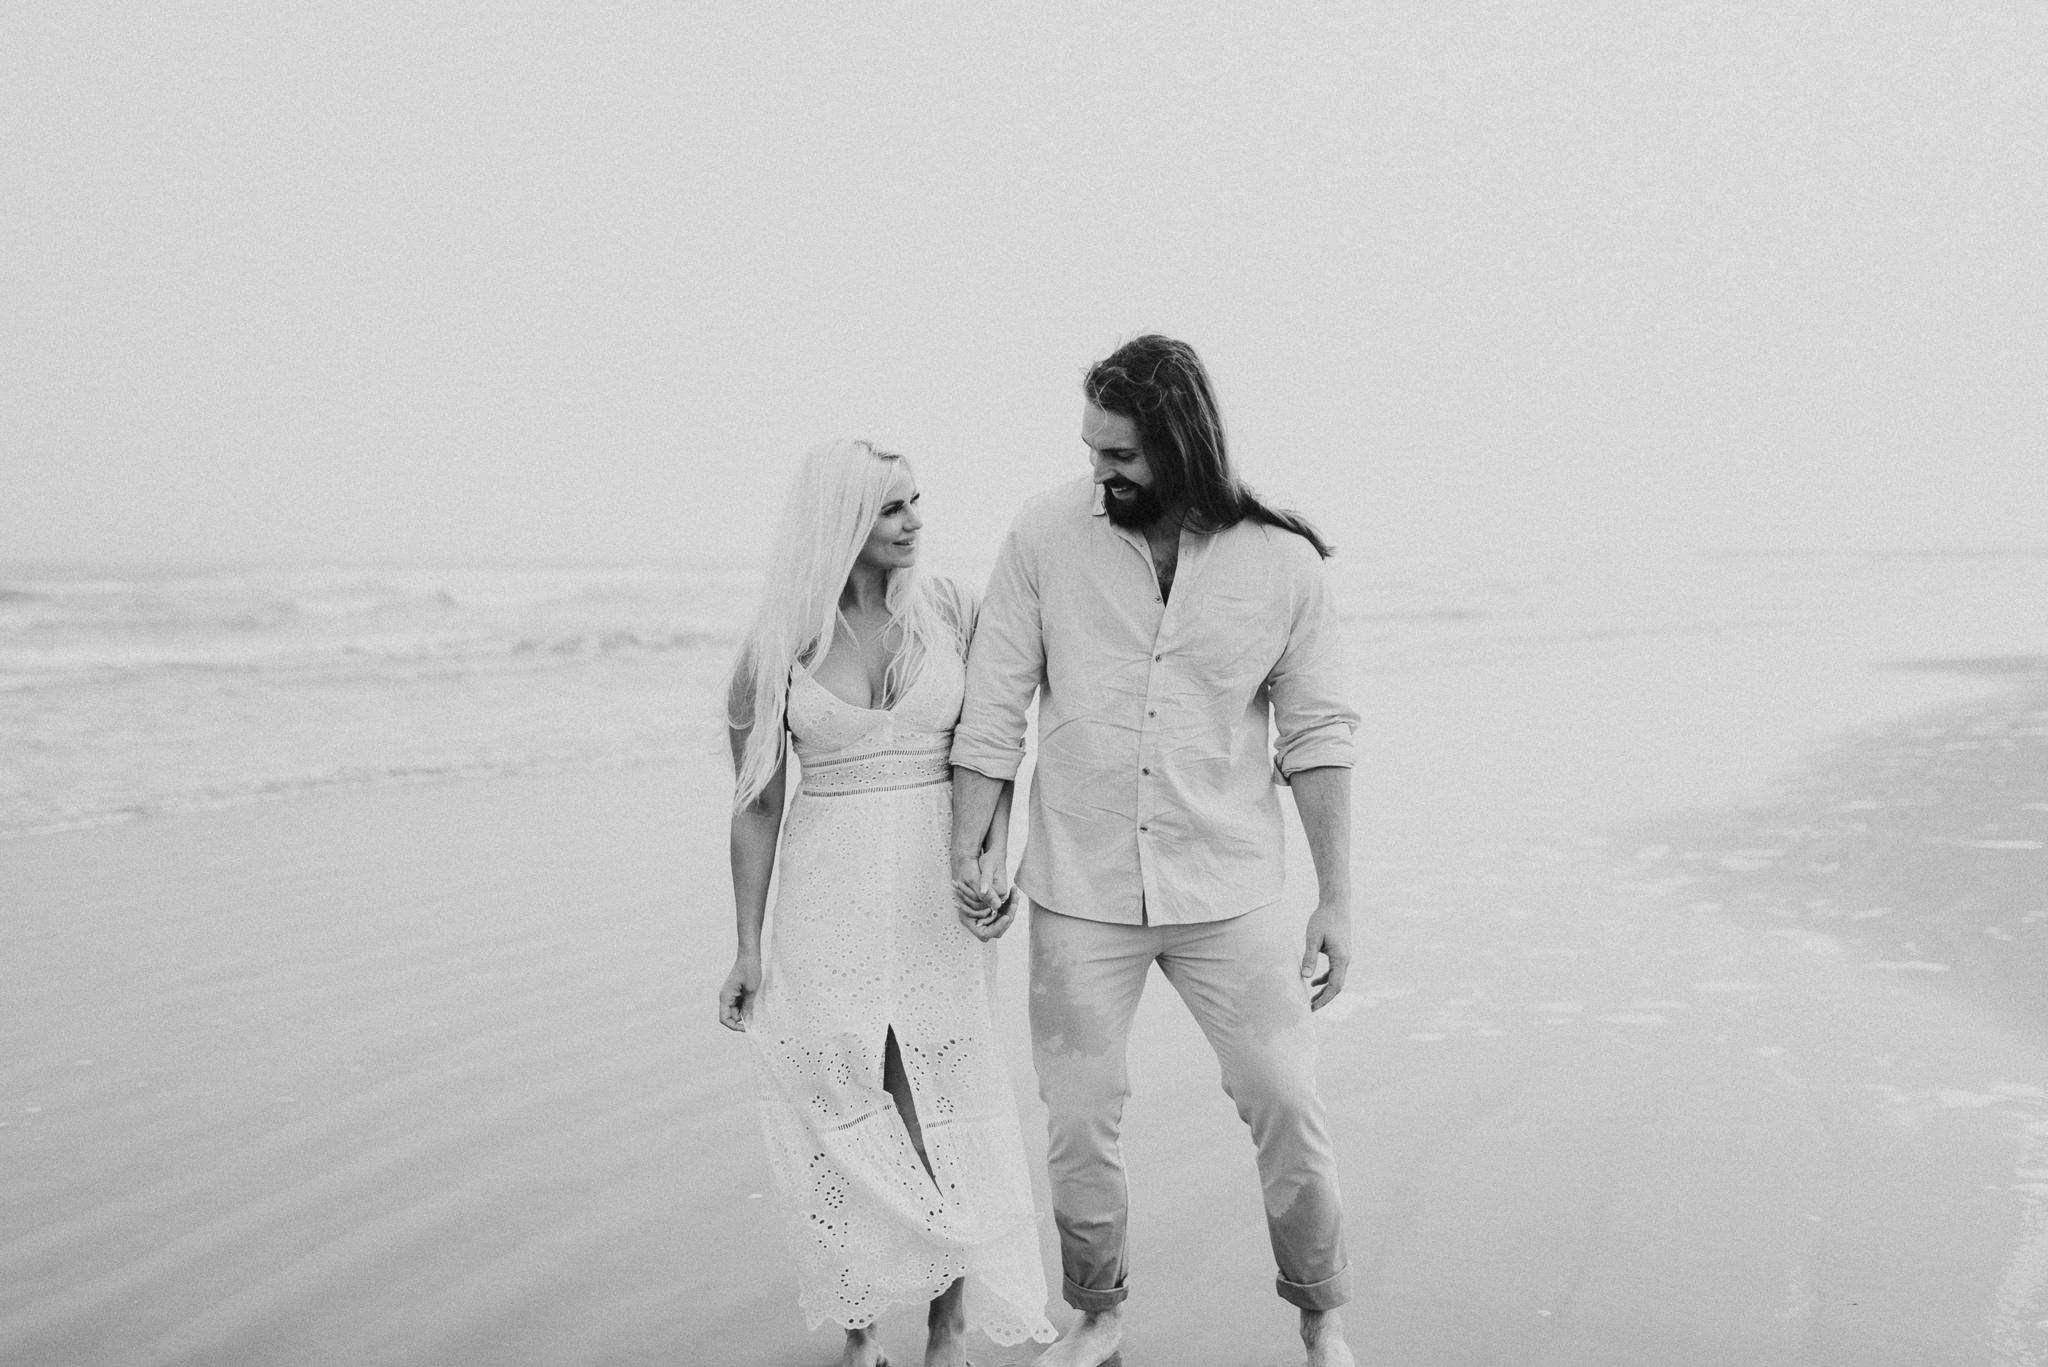 Ashley + Charles - Galveston Texas Moody Engagement Session | Kristen Giles Photography - 027.jpg